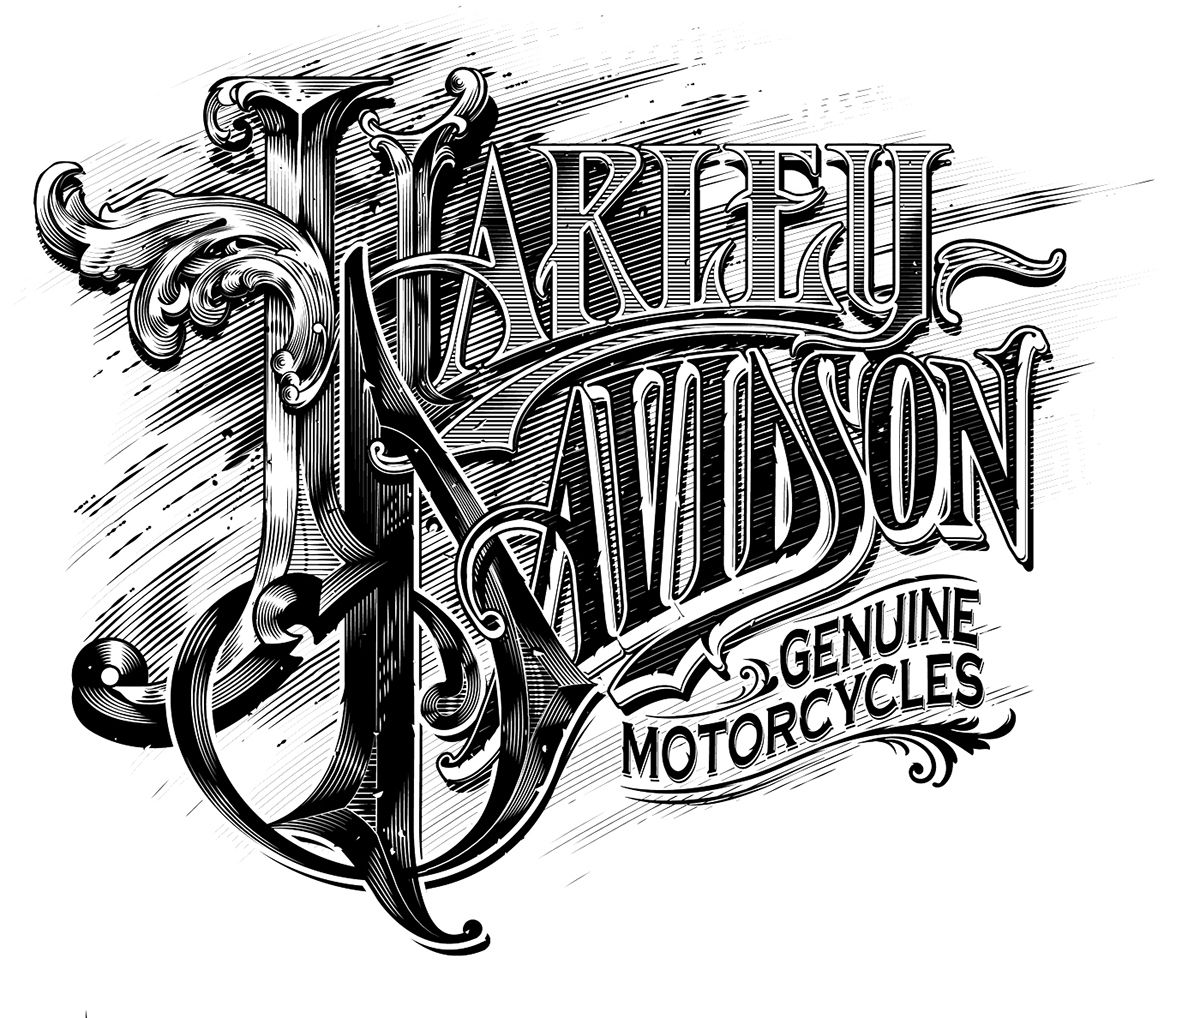 Harley Davidson by Abraham García Lettering